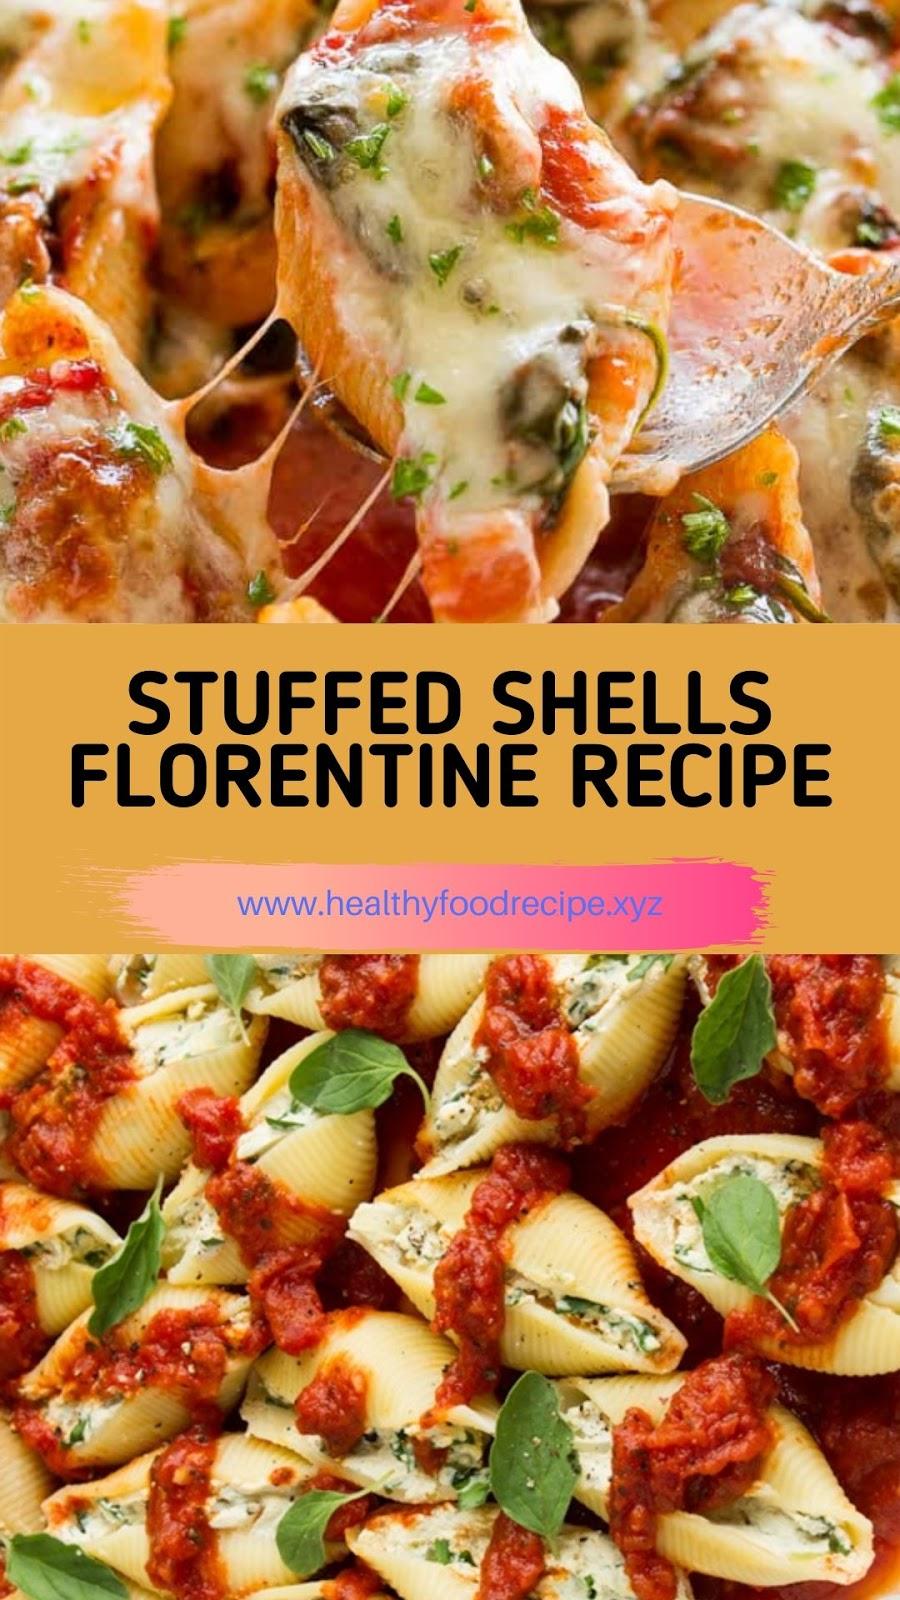 STUFFED SHELLS FLORENTINE RECIPE